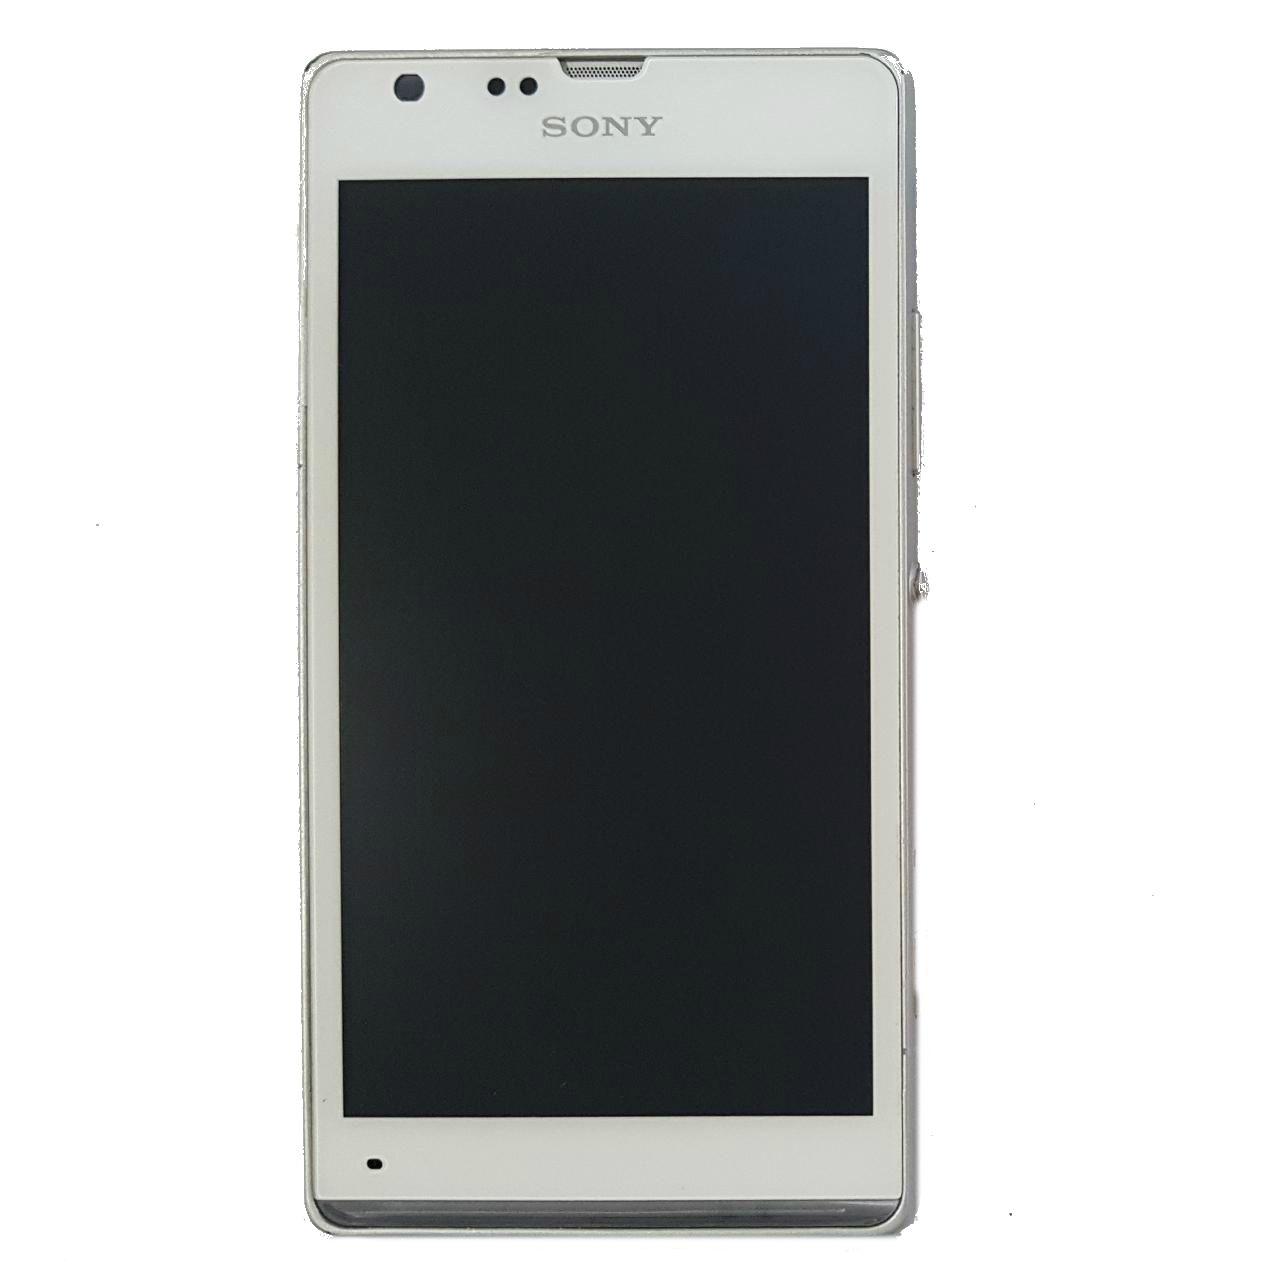 Display Frontal Sony Xperia C5303  SP Branco Original Retirado